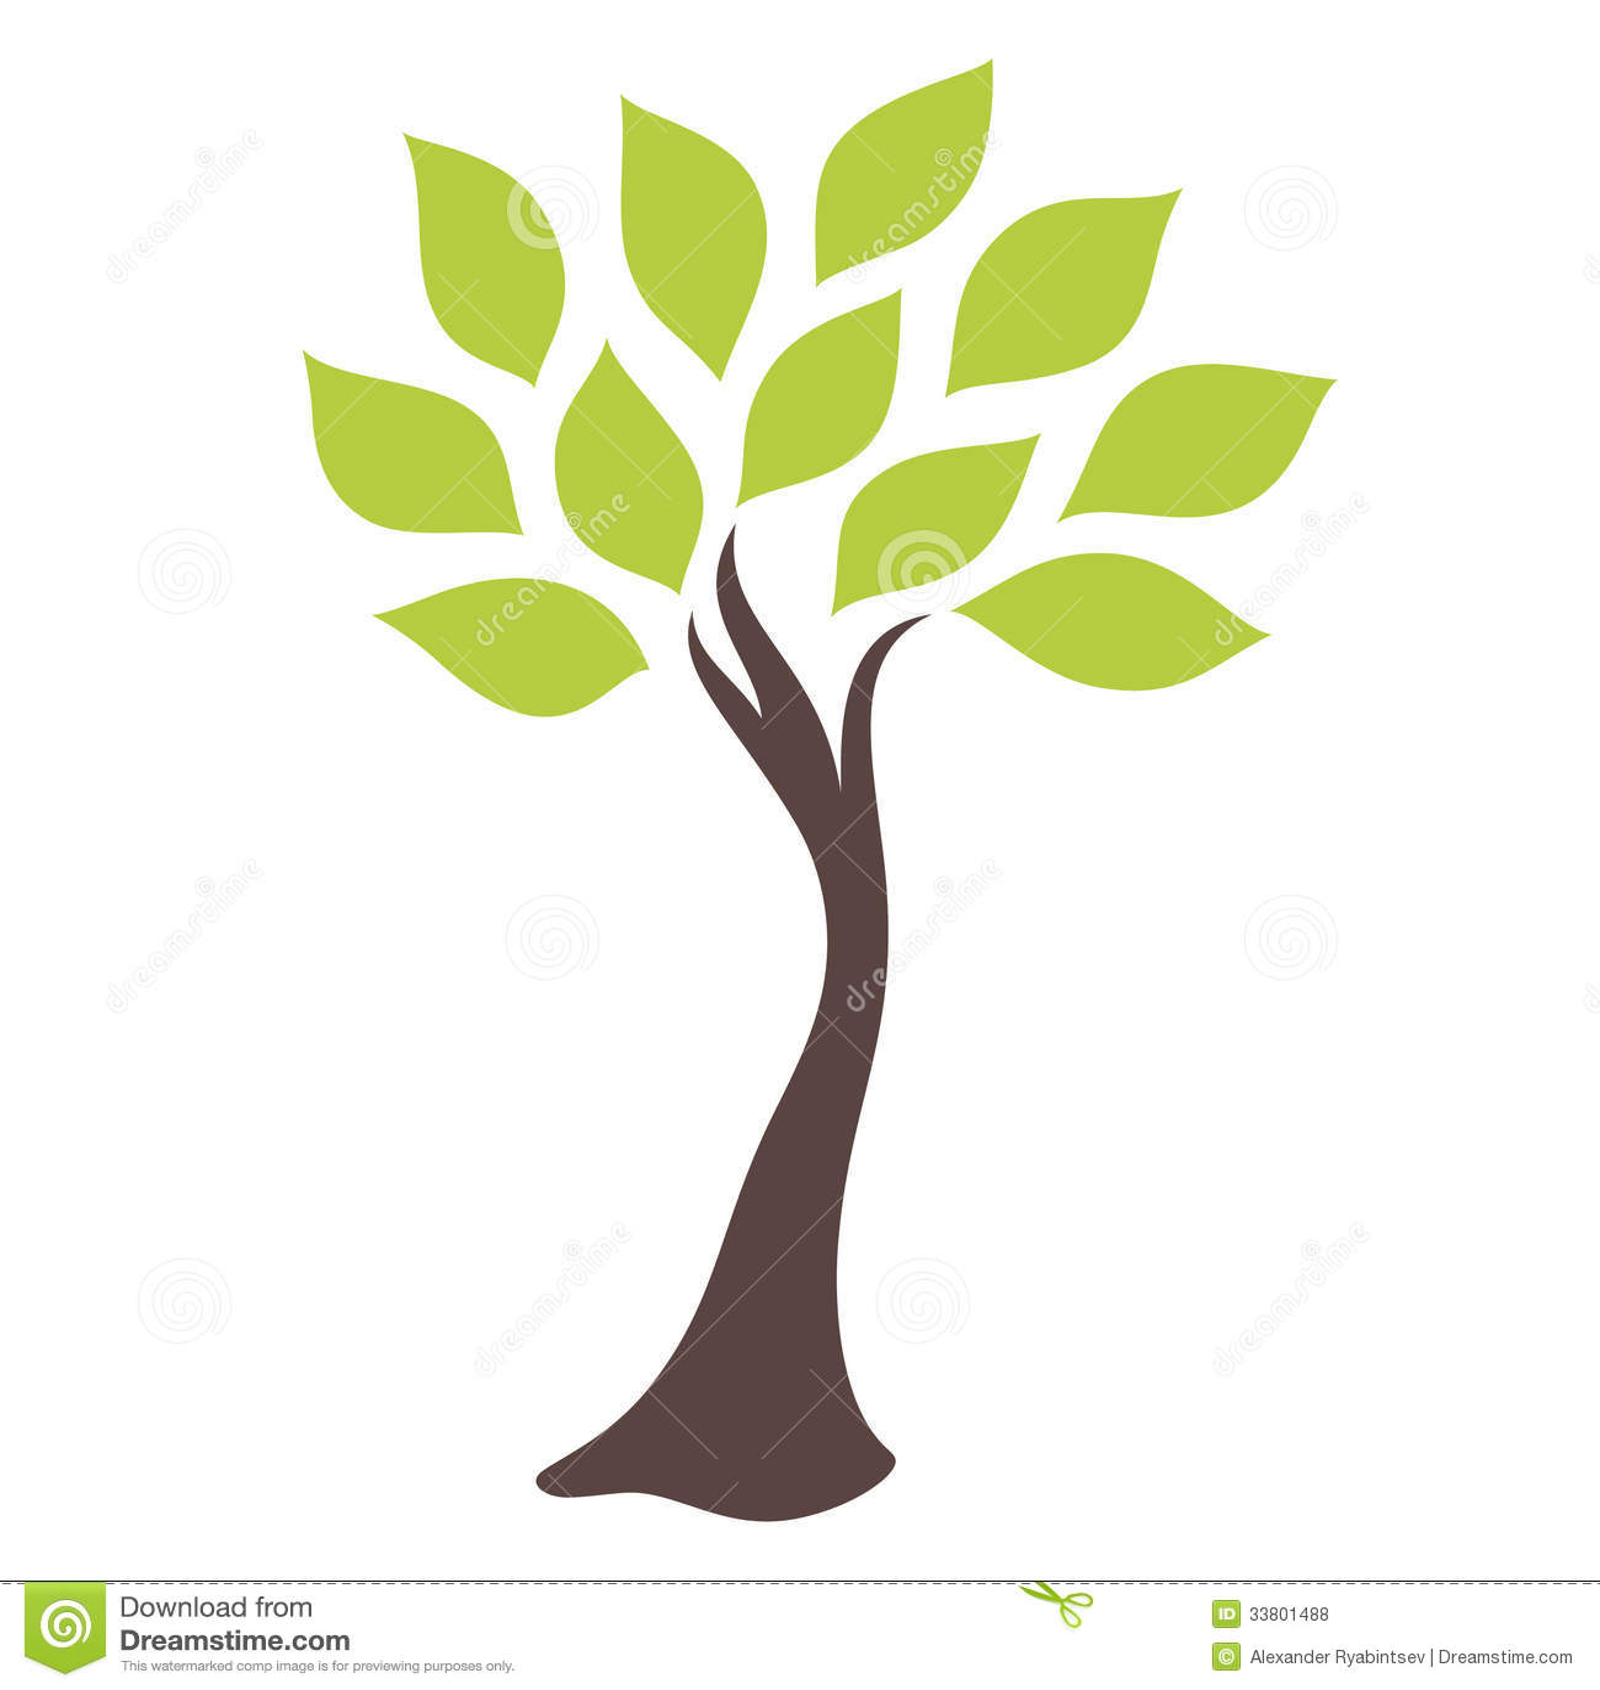 Elegant Green Tree Royalty Free Stock Photos - Image: 33801488